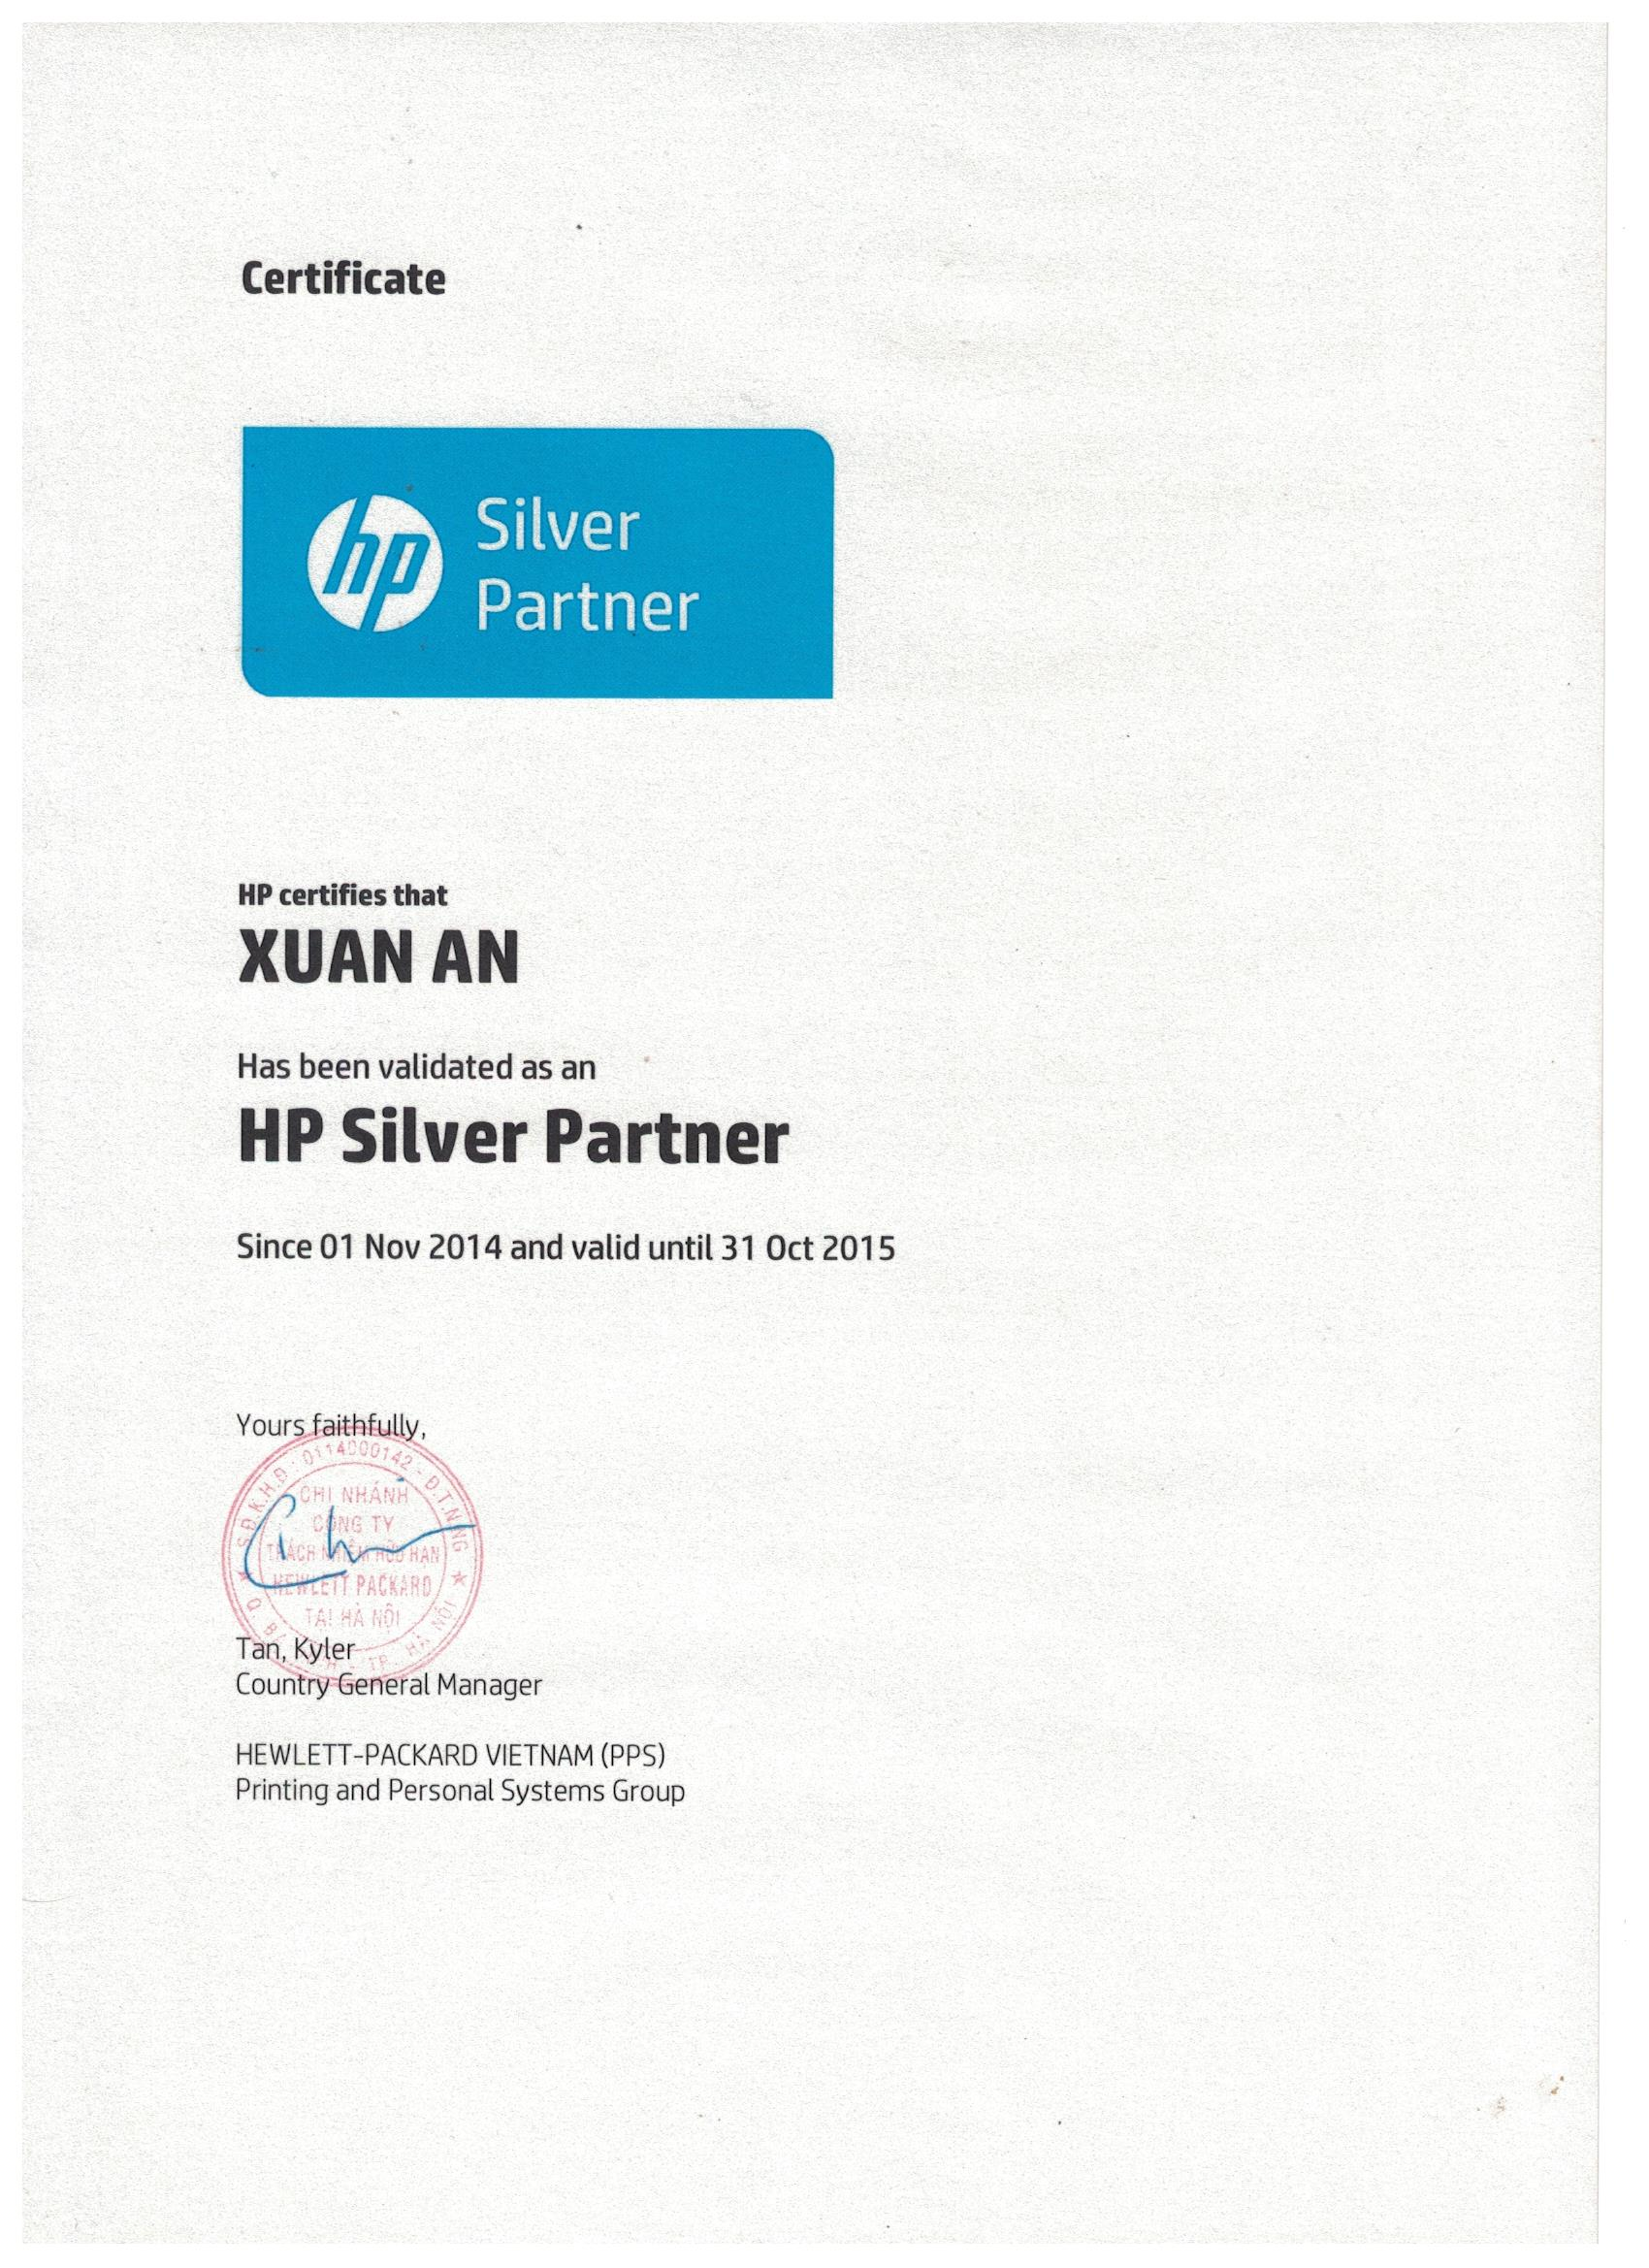 HP Probook 430 G7 - 9GQ05PA (Silver)